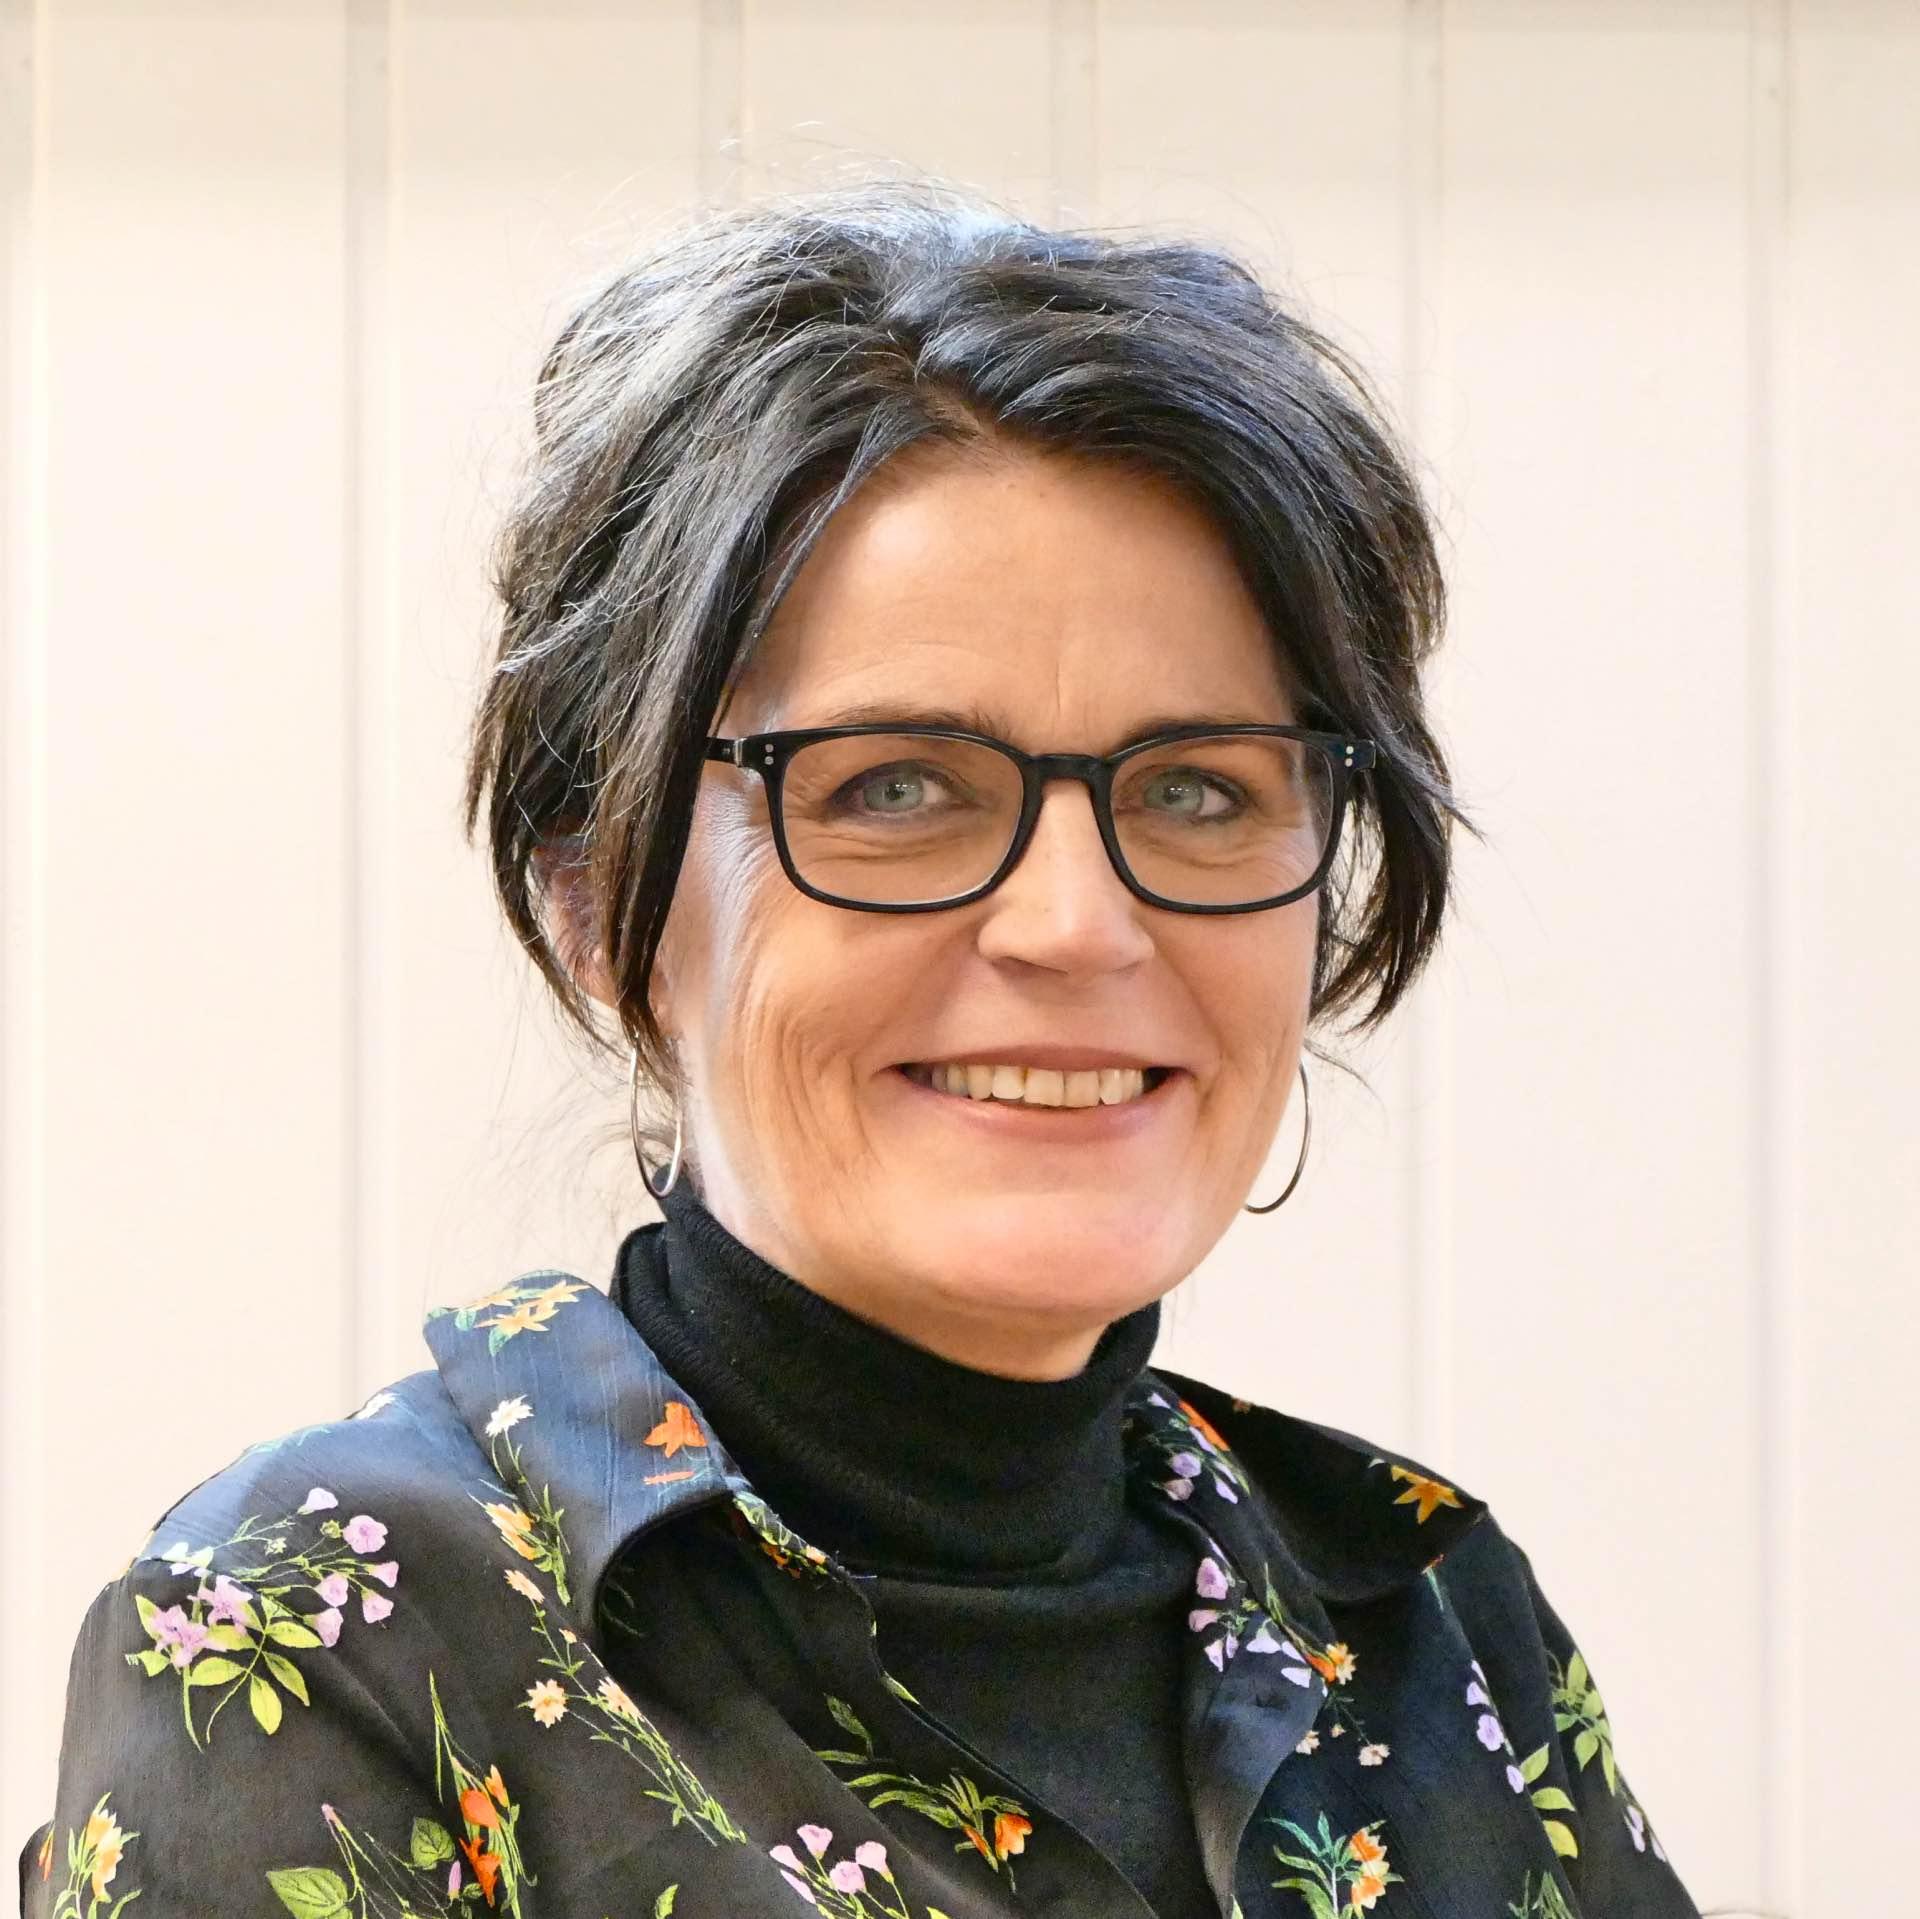 Marianne Kamp Jensen